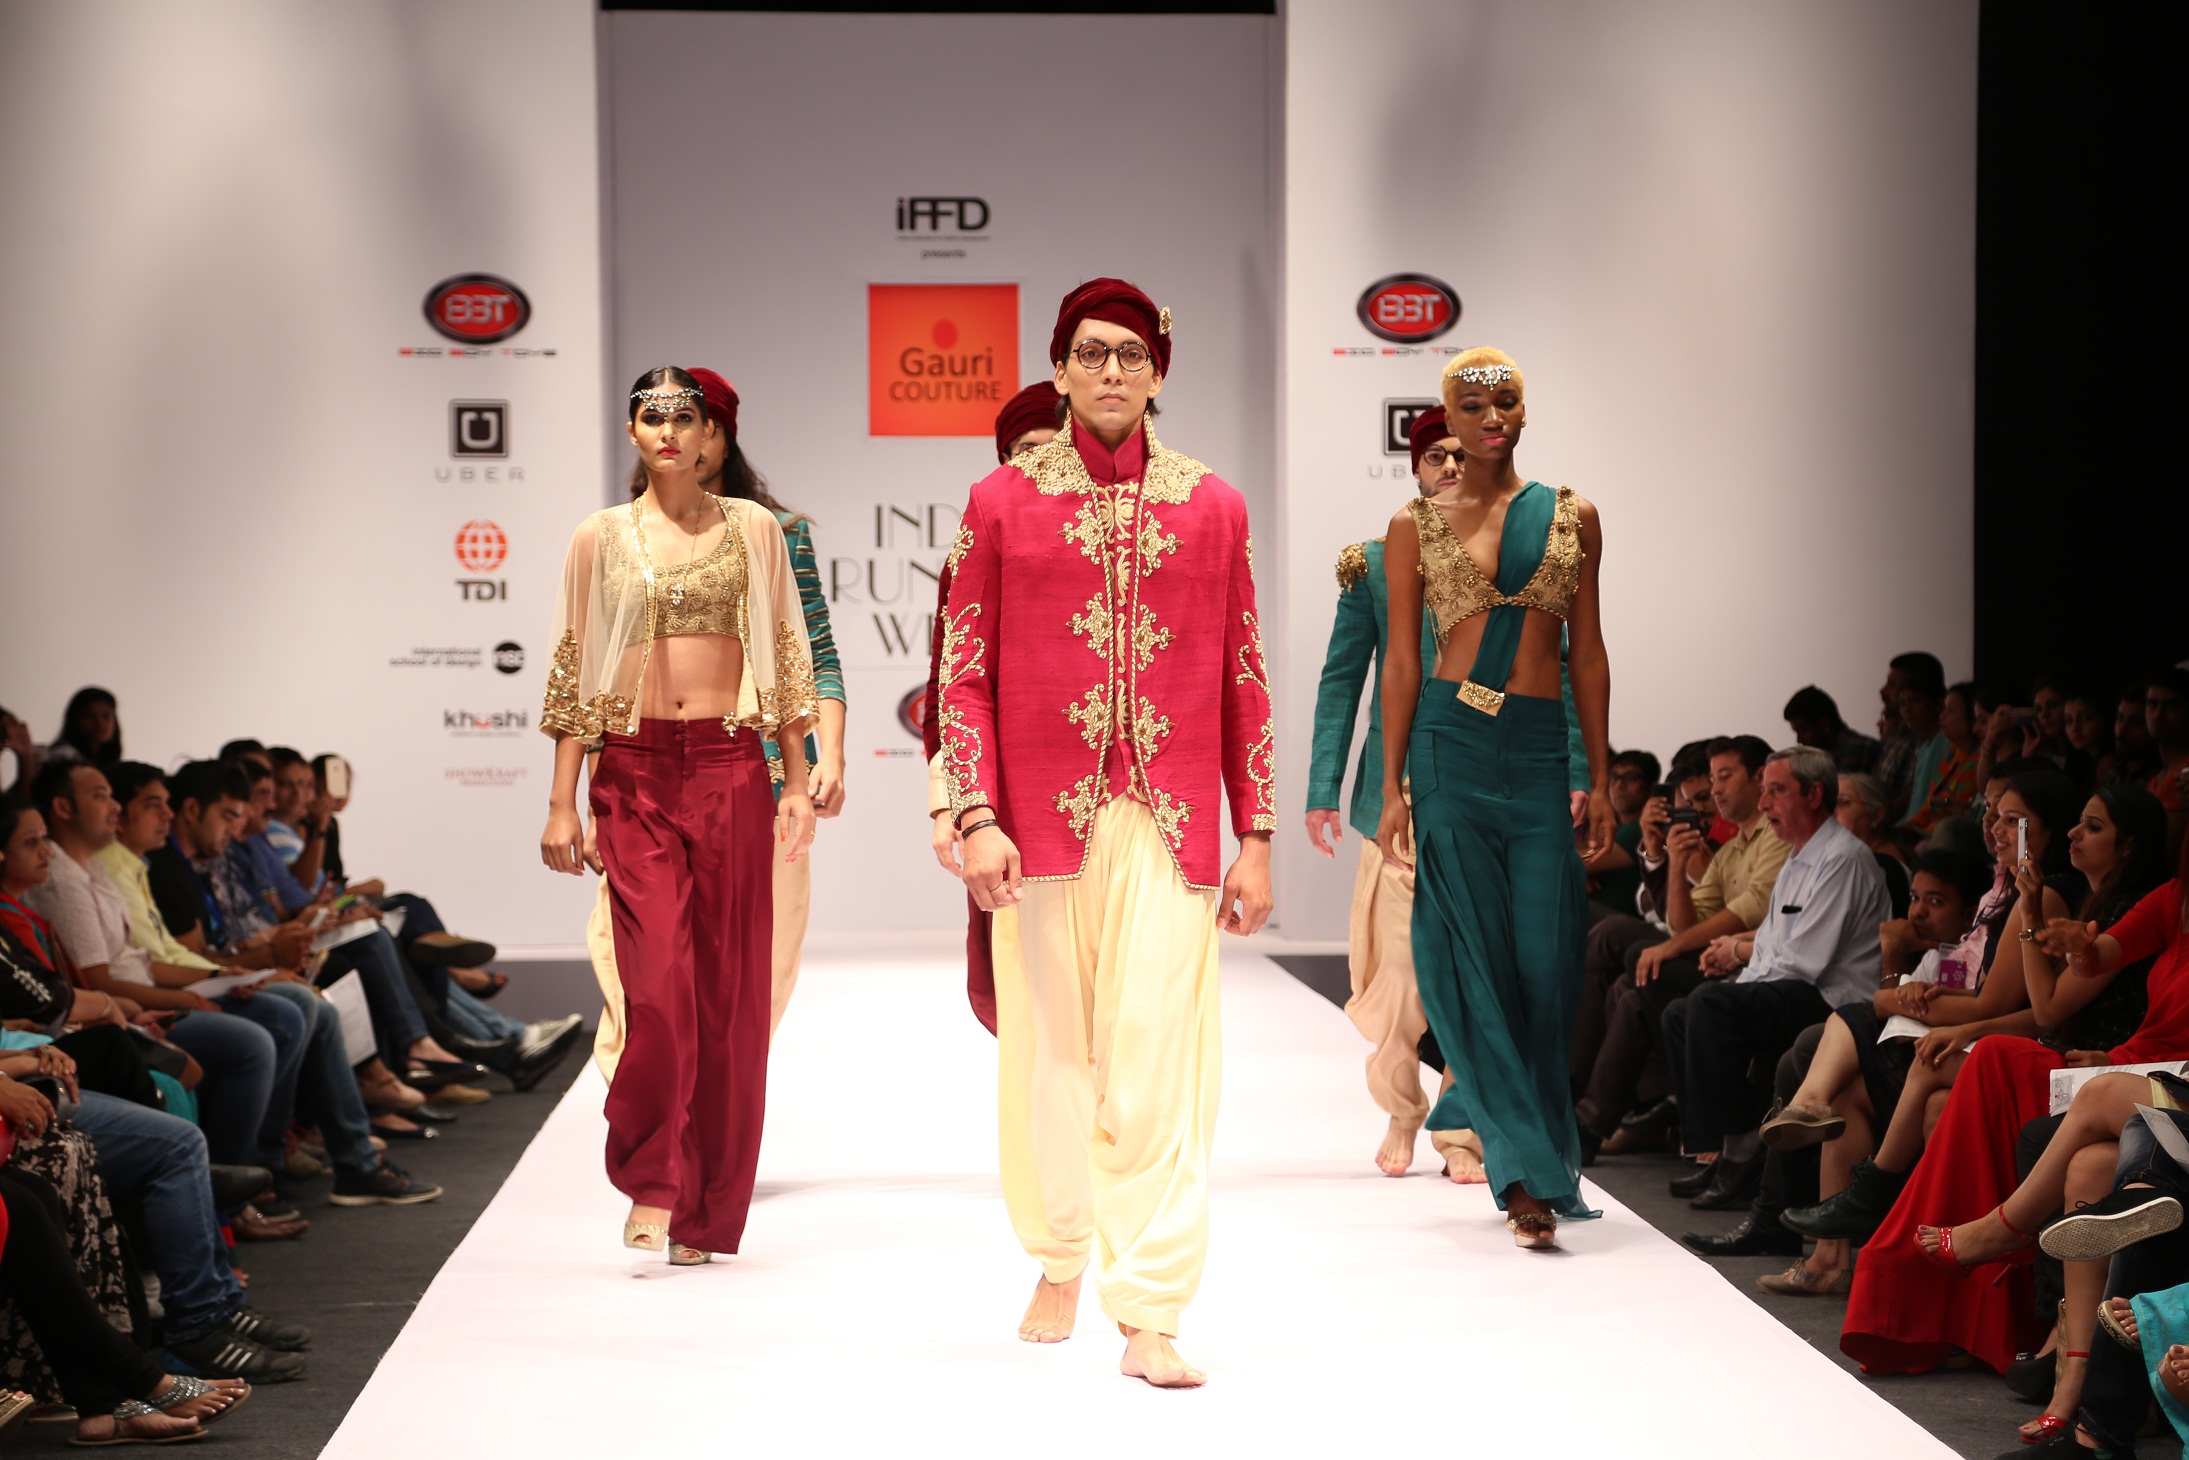 Gauri Couture by Nikheil